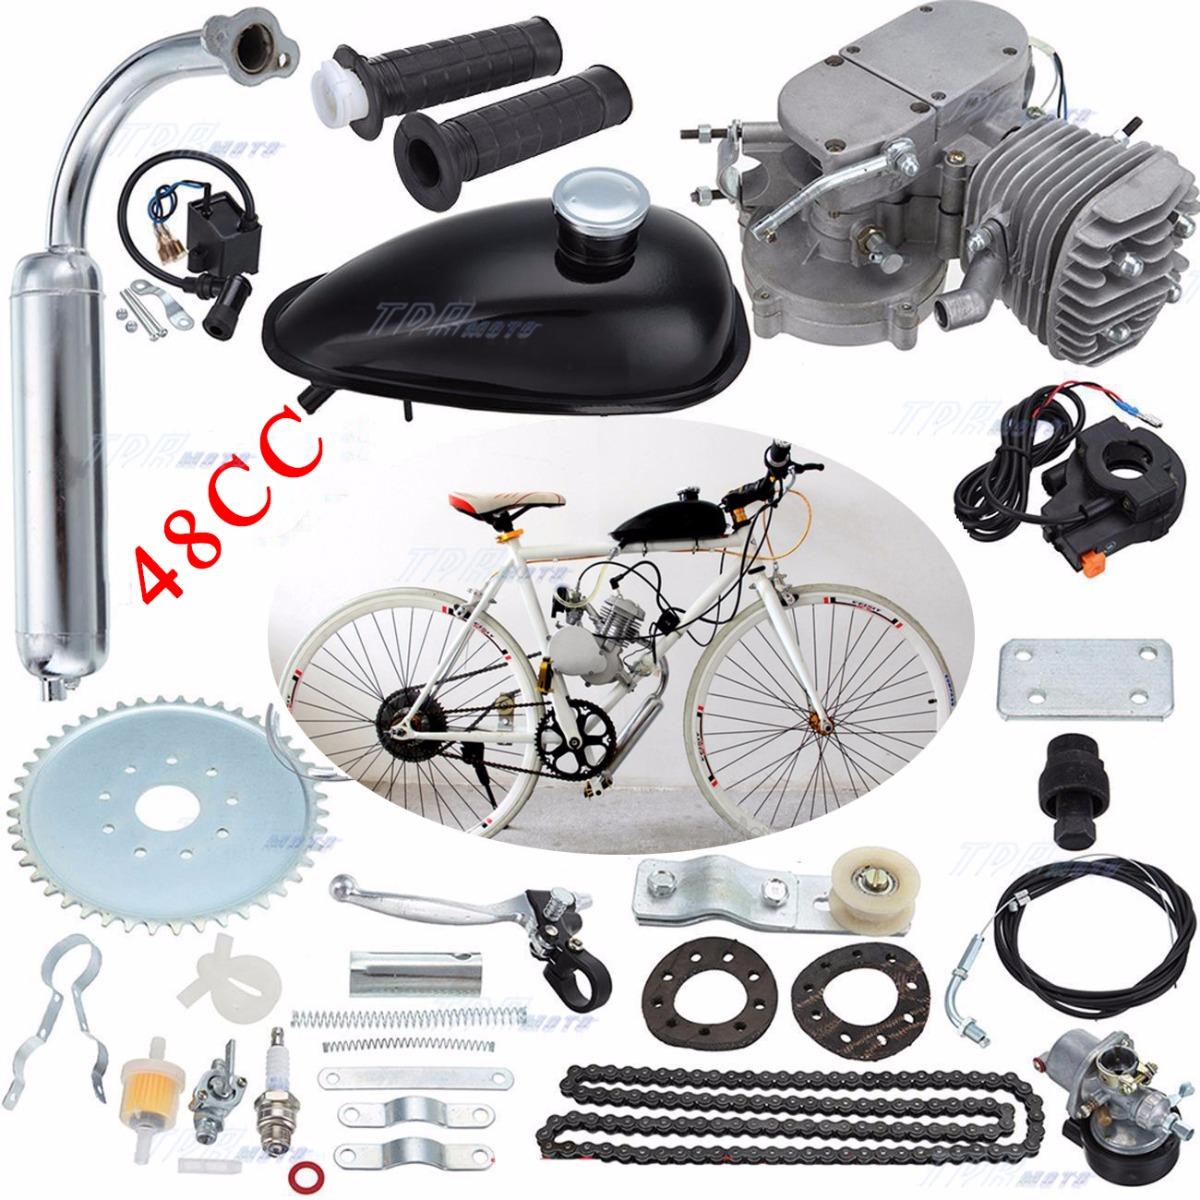 Electric Motor Kits For Push Bikes: 49cc 2 Stroke Engine Motor Kit For Motorised Push Bike